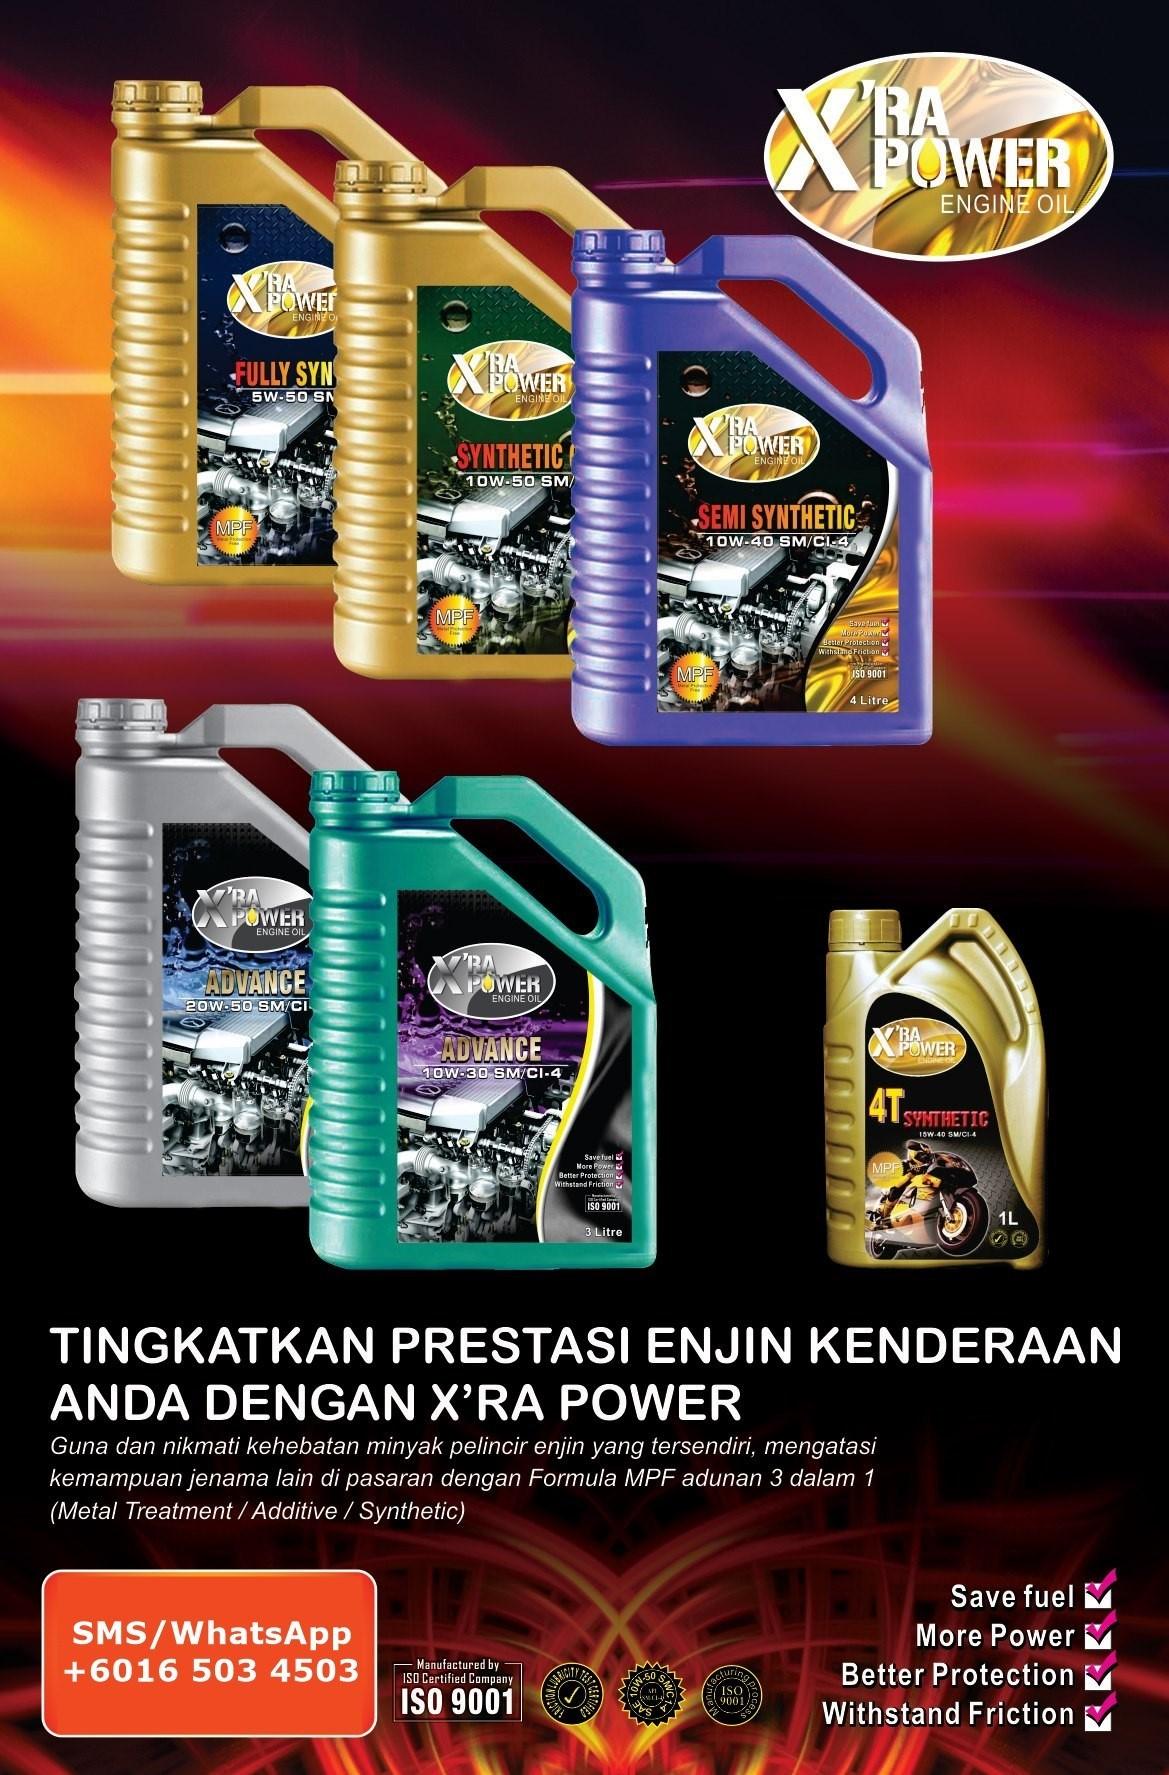 harga minyak enjin mahal di malaysia